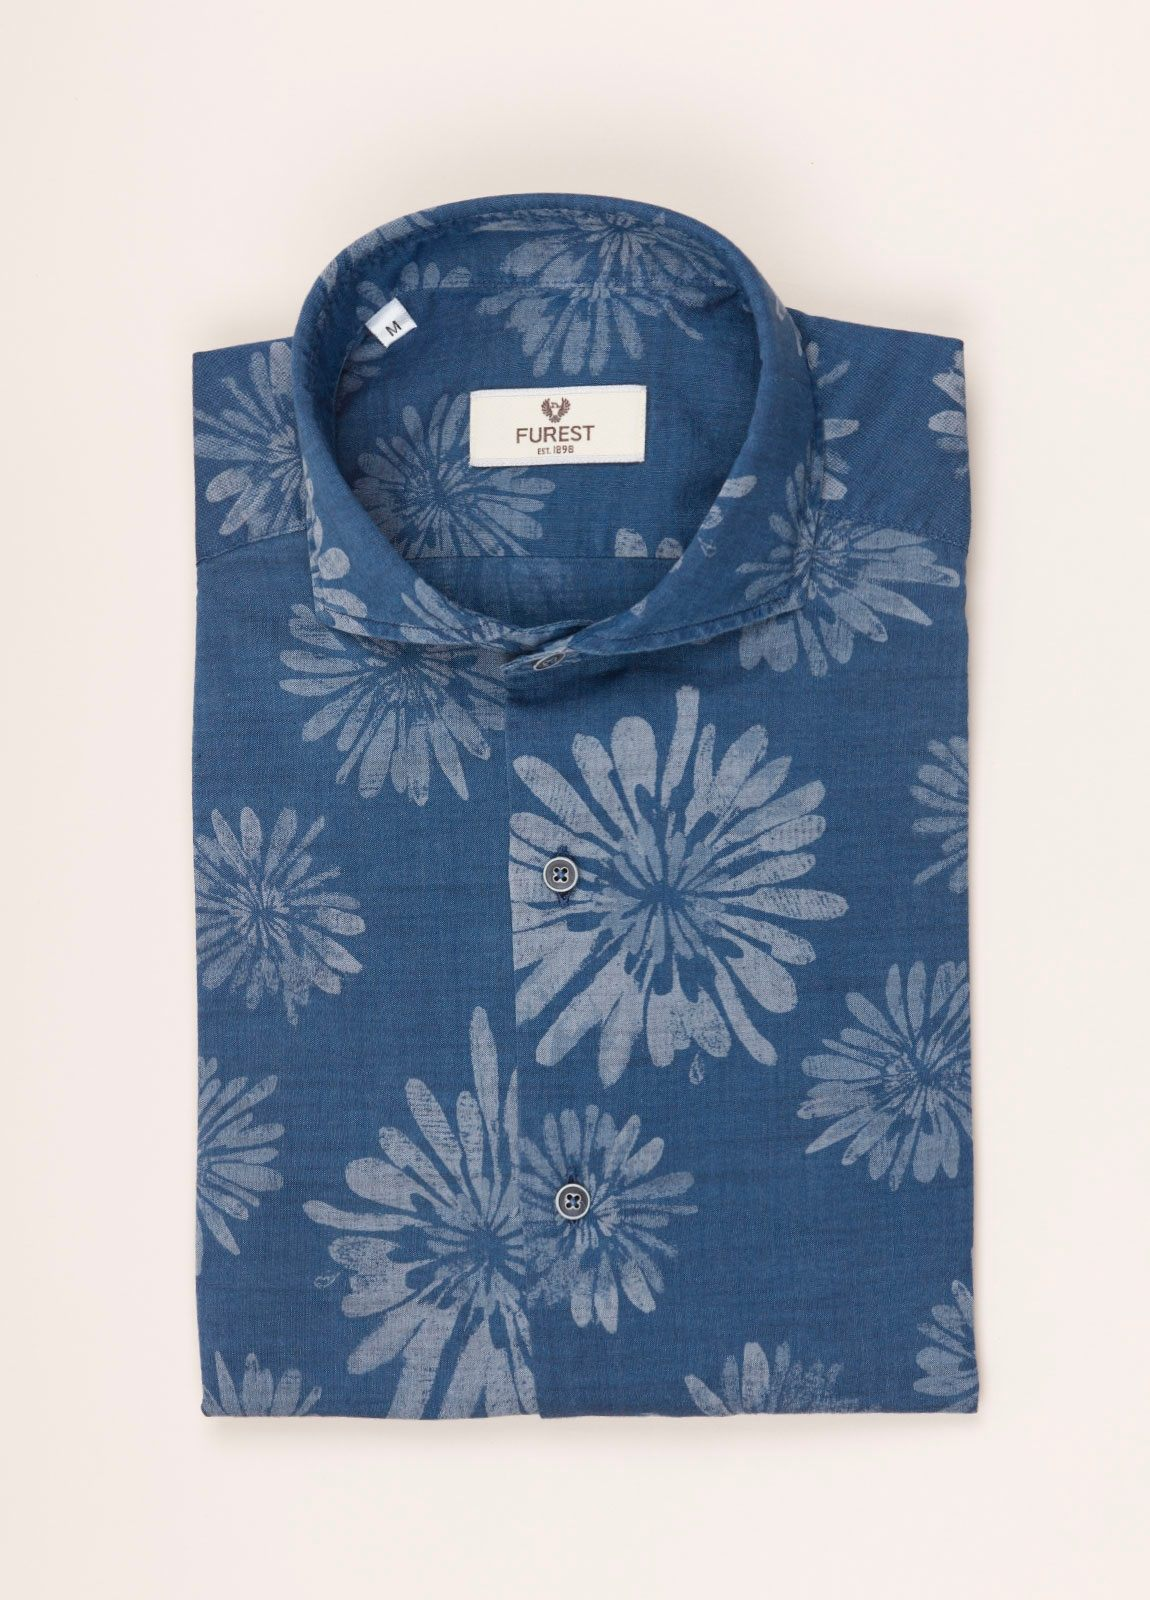 Camisa sport FUREST COLECCIÓN SLIM FIT dibujo azul denim